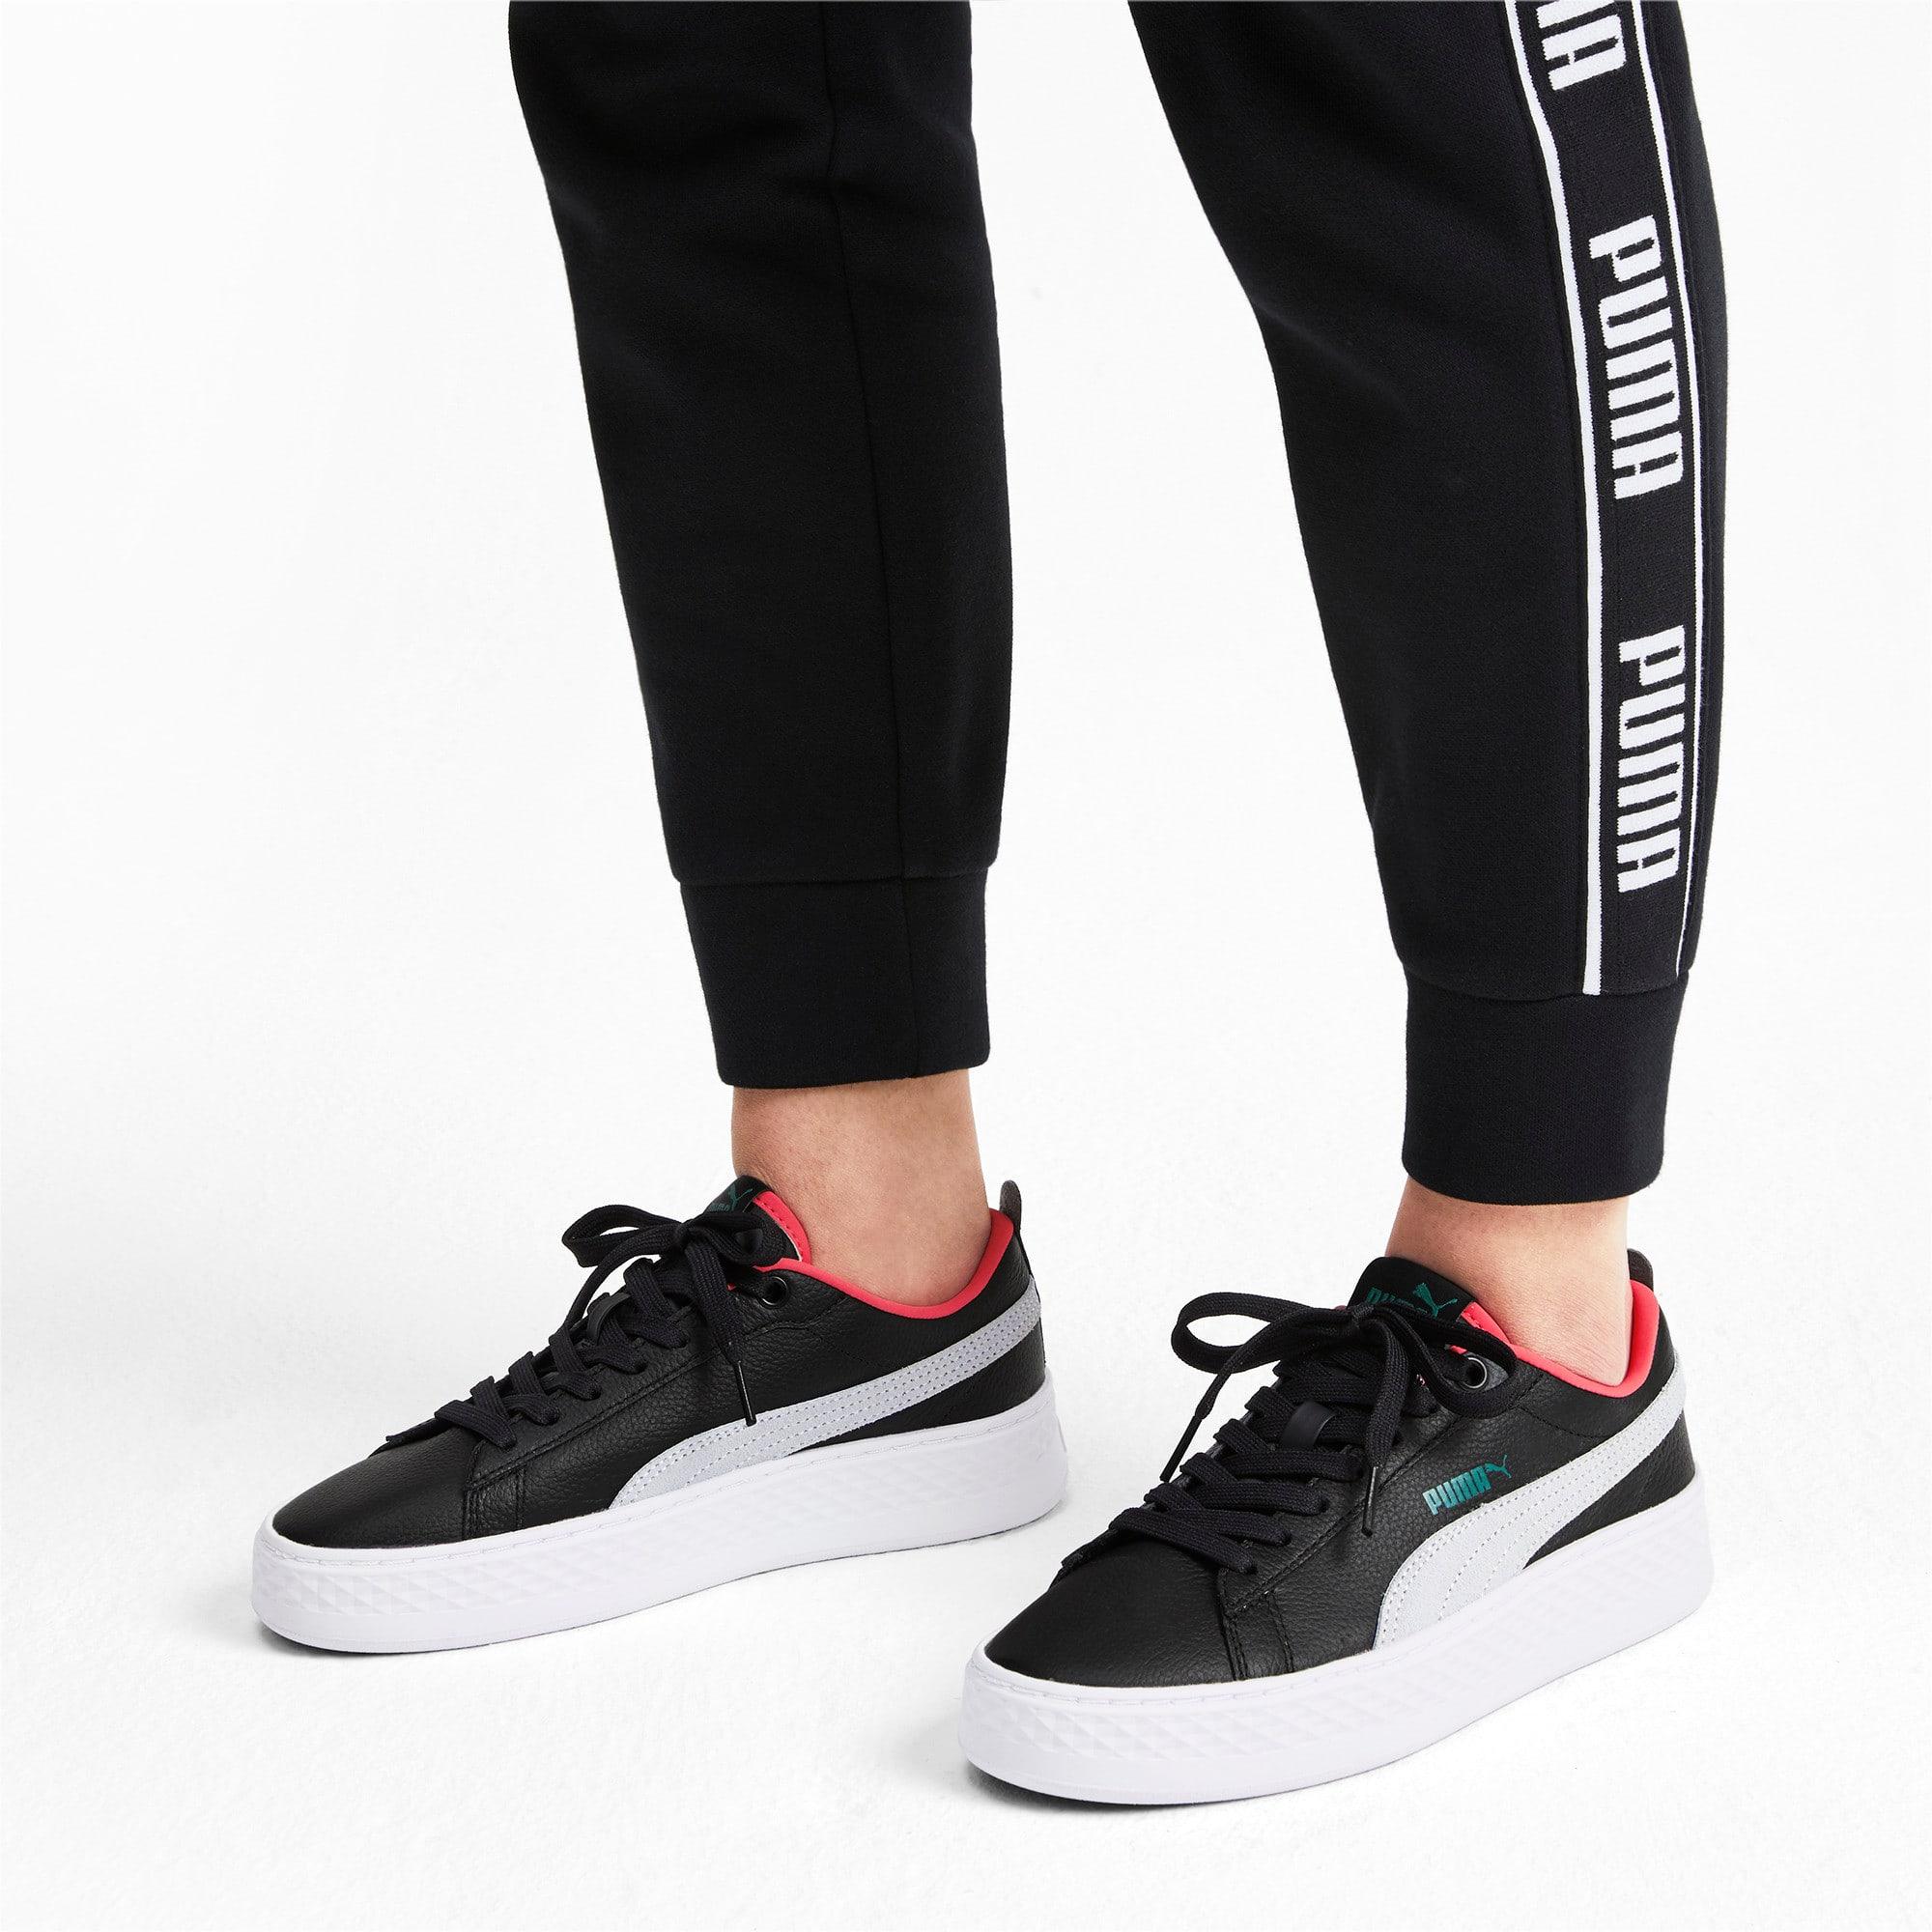 Thumbnail 2 of Puma Smash Platform Women's Shoes, Black-White-T Green-C Coral, medium-IND